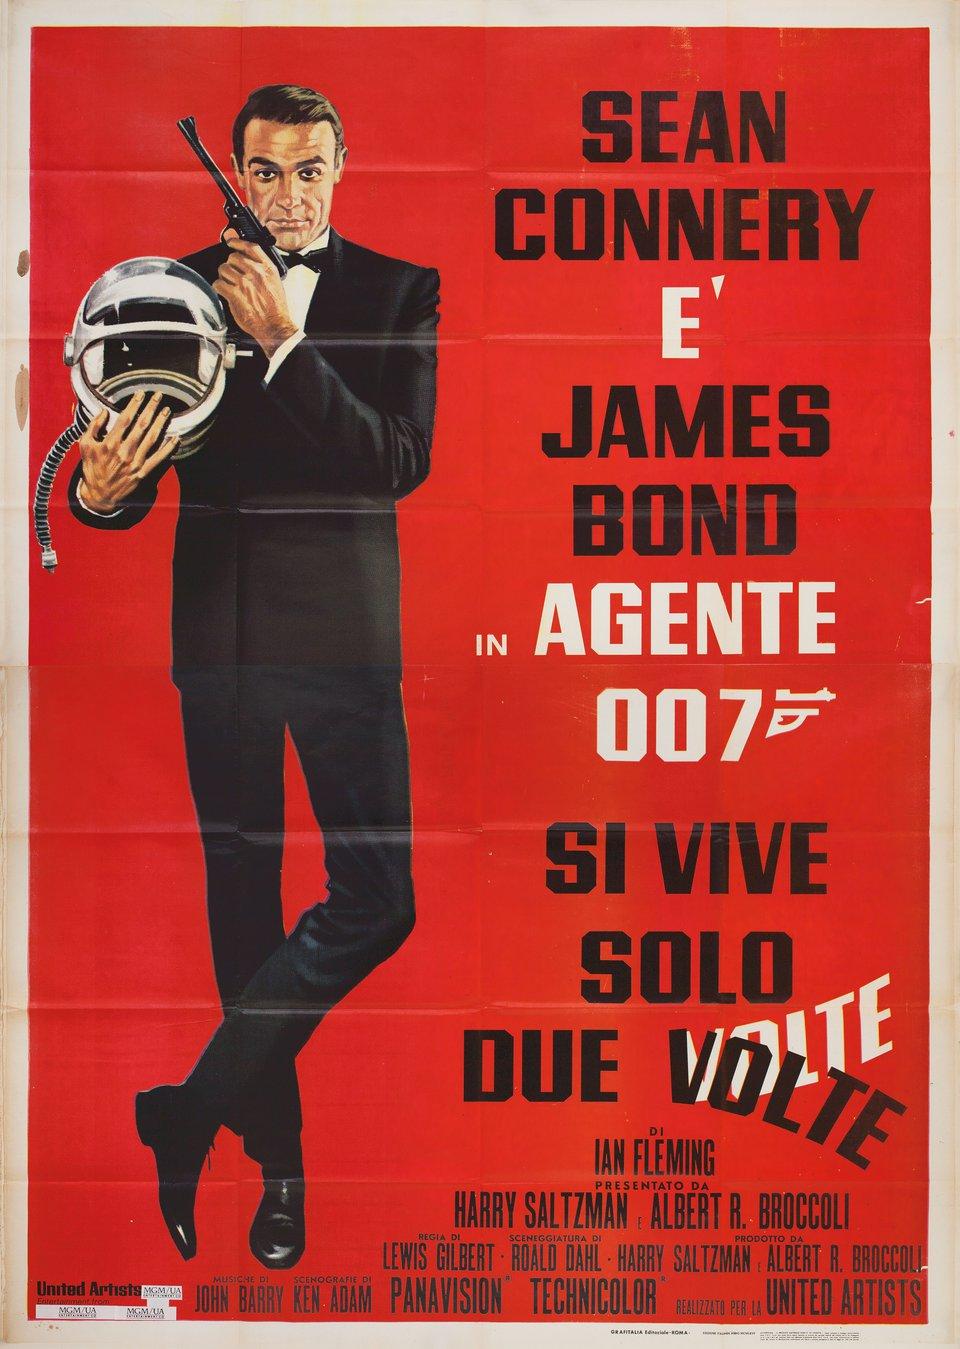 You Only Live Twice R1970s Italian Quattro Fogli Poster